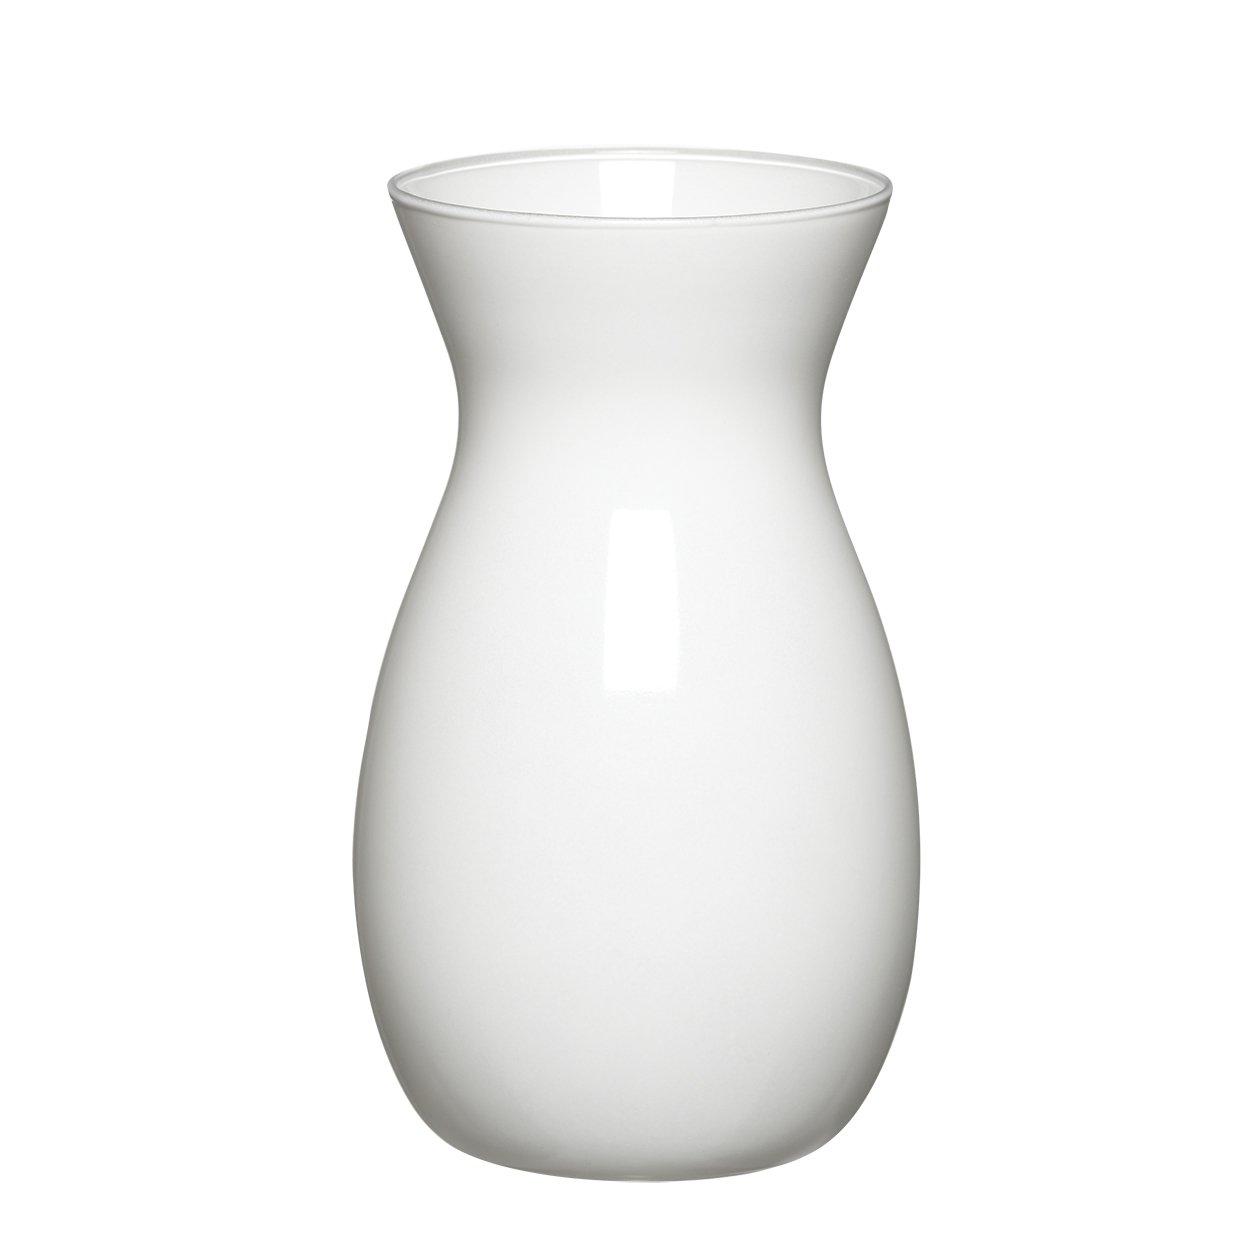 Amazon syndicate sales 8 jordan vase white planters amazon syndicate sales 8 jordan vase white planters garden outdoor reviewsmspy